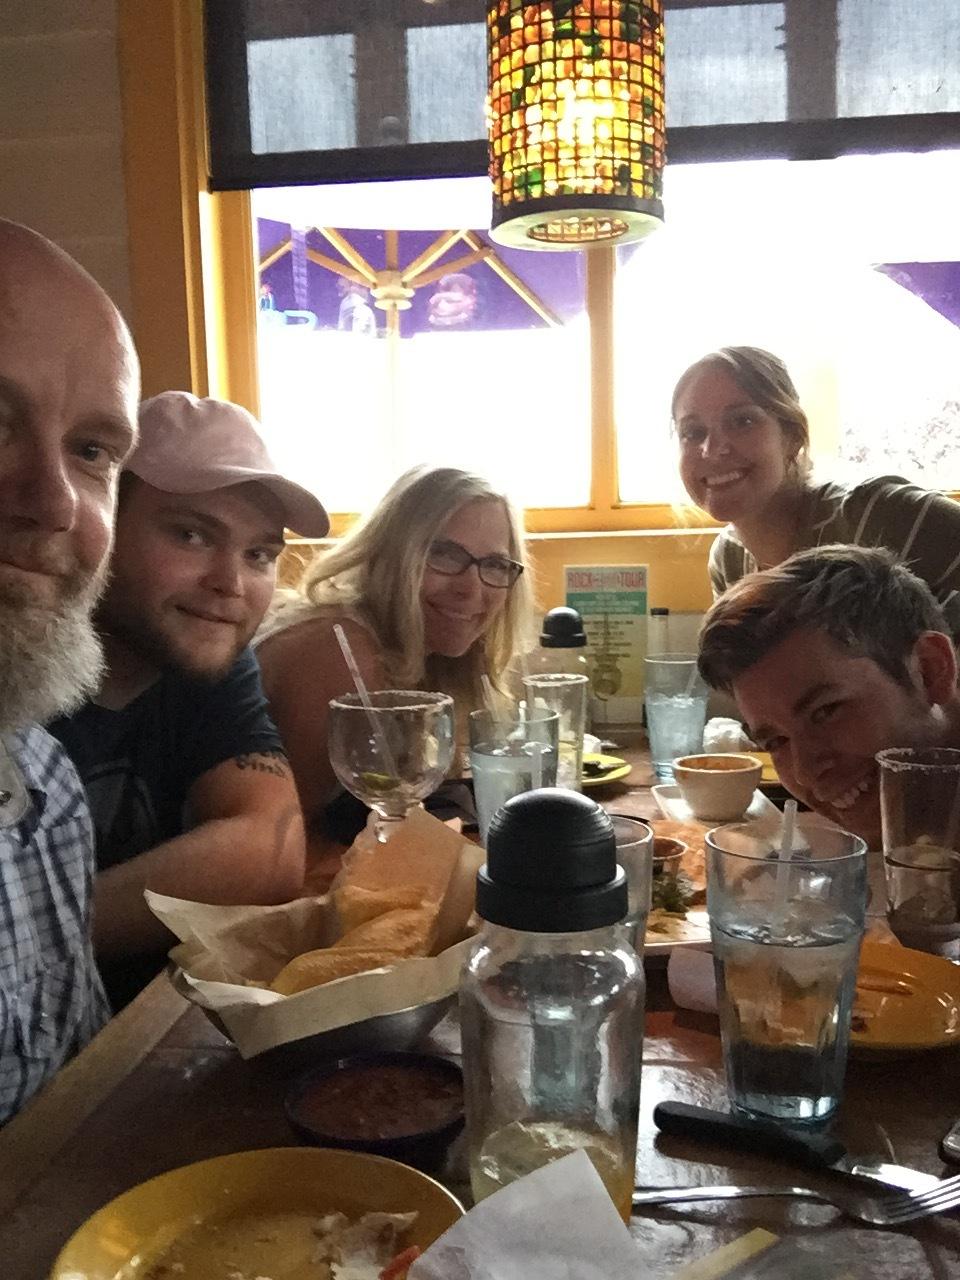 Celebrating over margaritas at Brenda's impromptu birthday bash